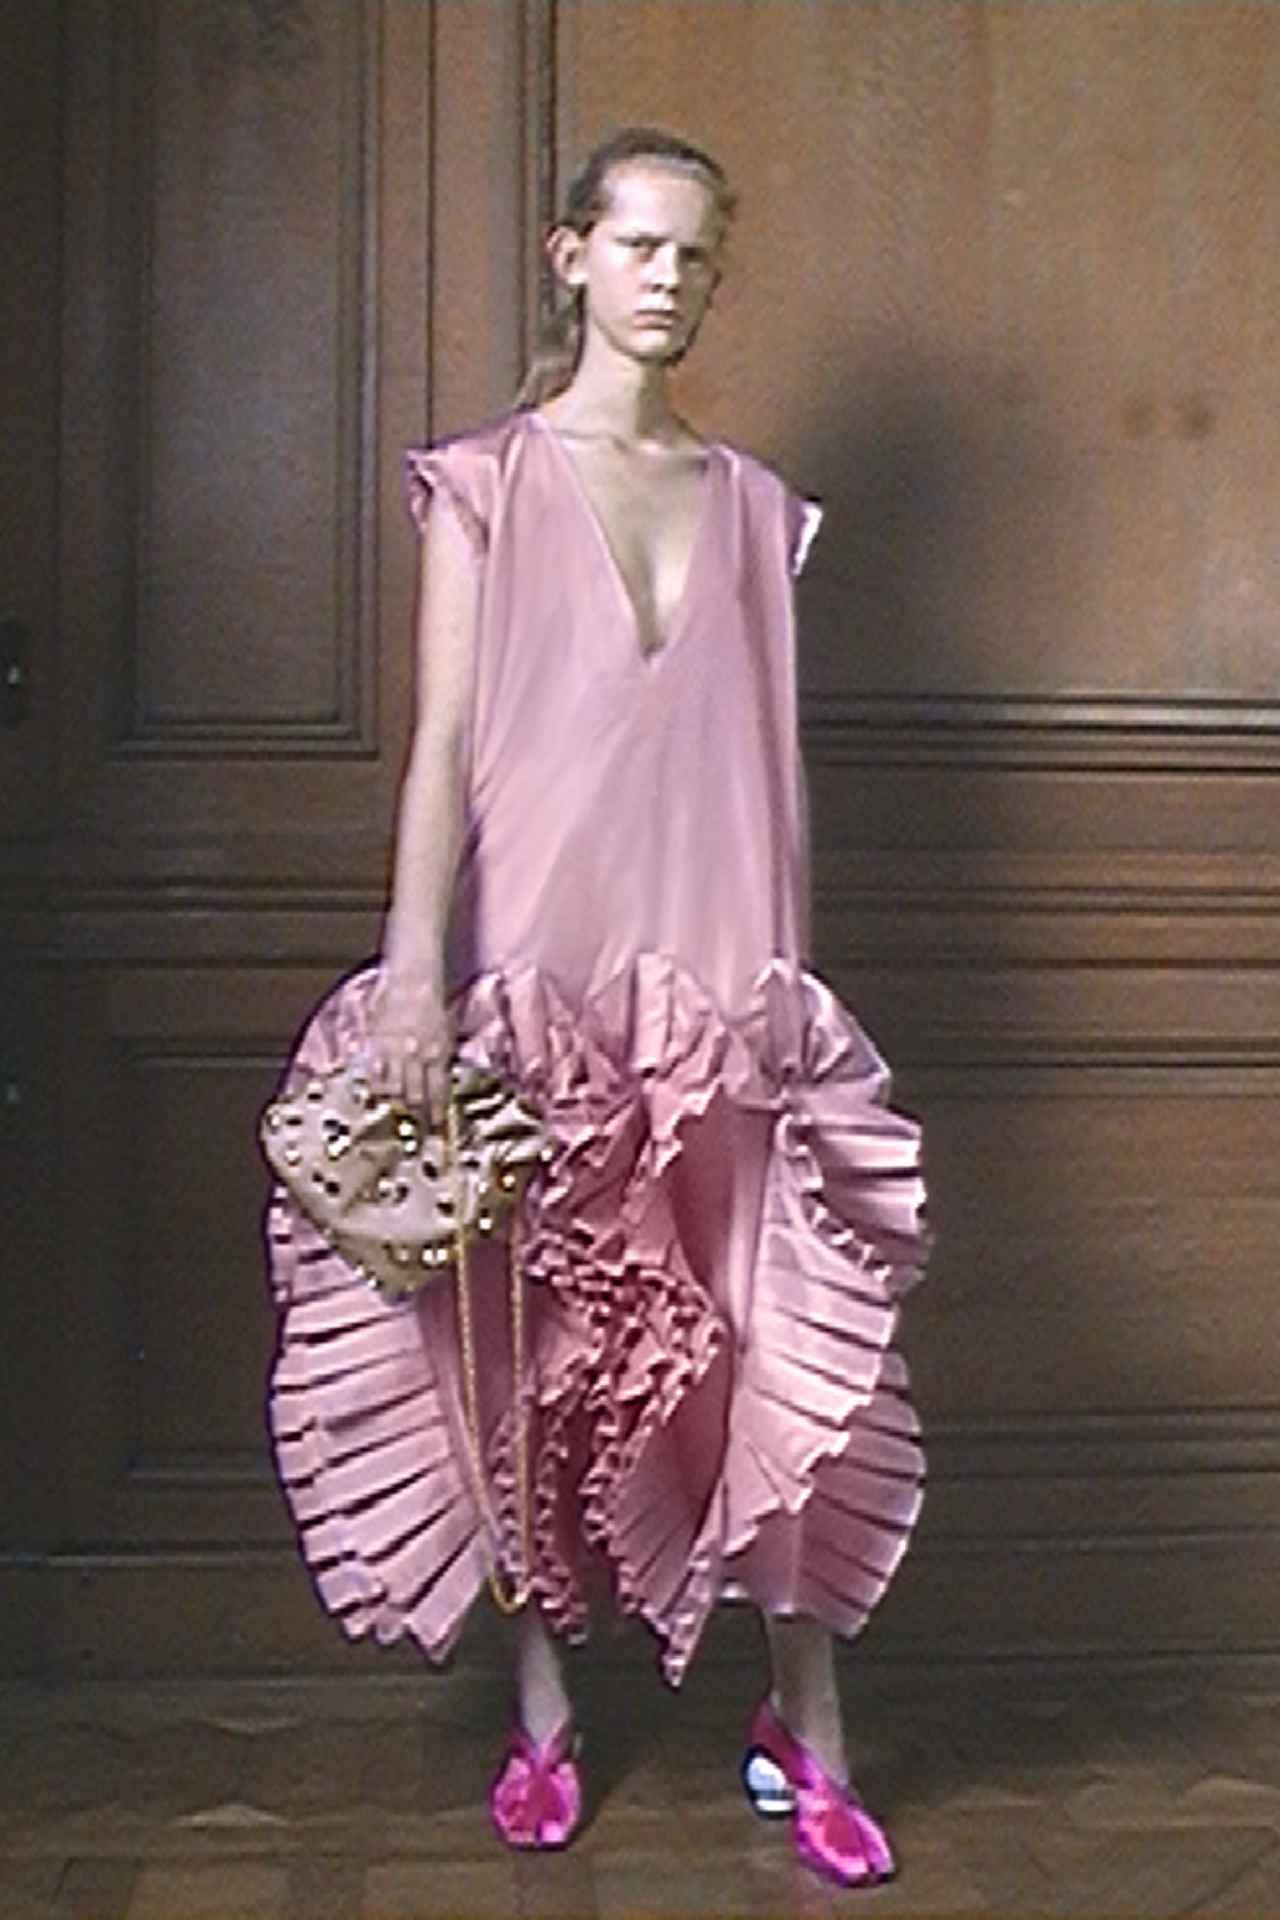 Images : 7番目の画像 - 「ドレス自由自在<Vol.2> 新しい才能が花盛り。 ニュー・ドレス時代到来」のアルバム - T JAPAN:The New York Times Style Magazine 公式サイト